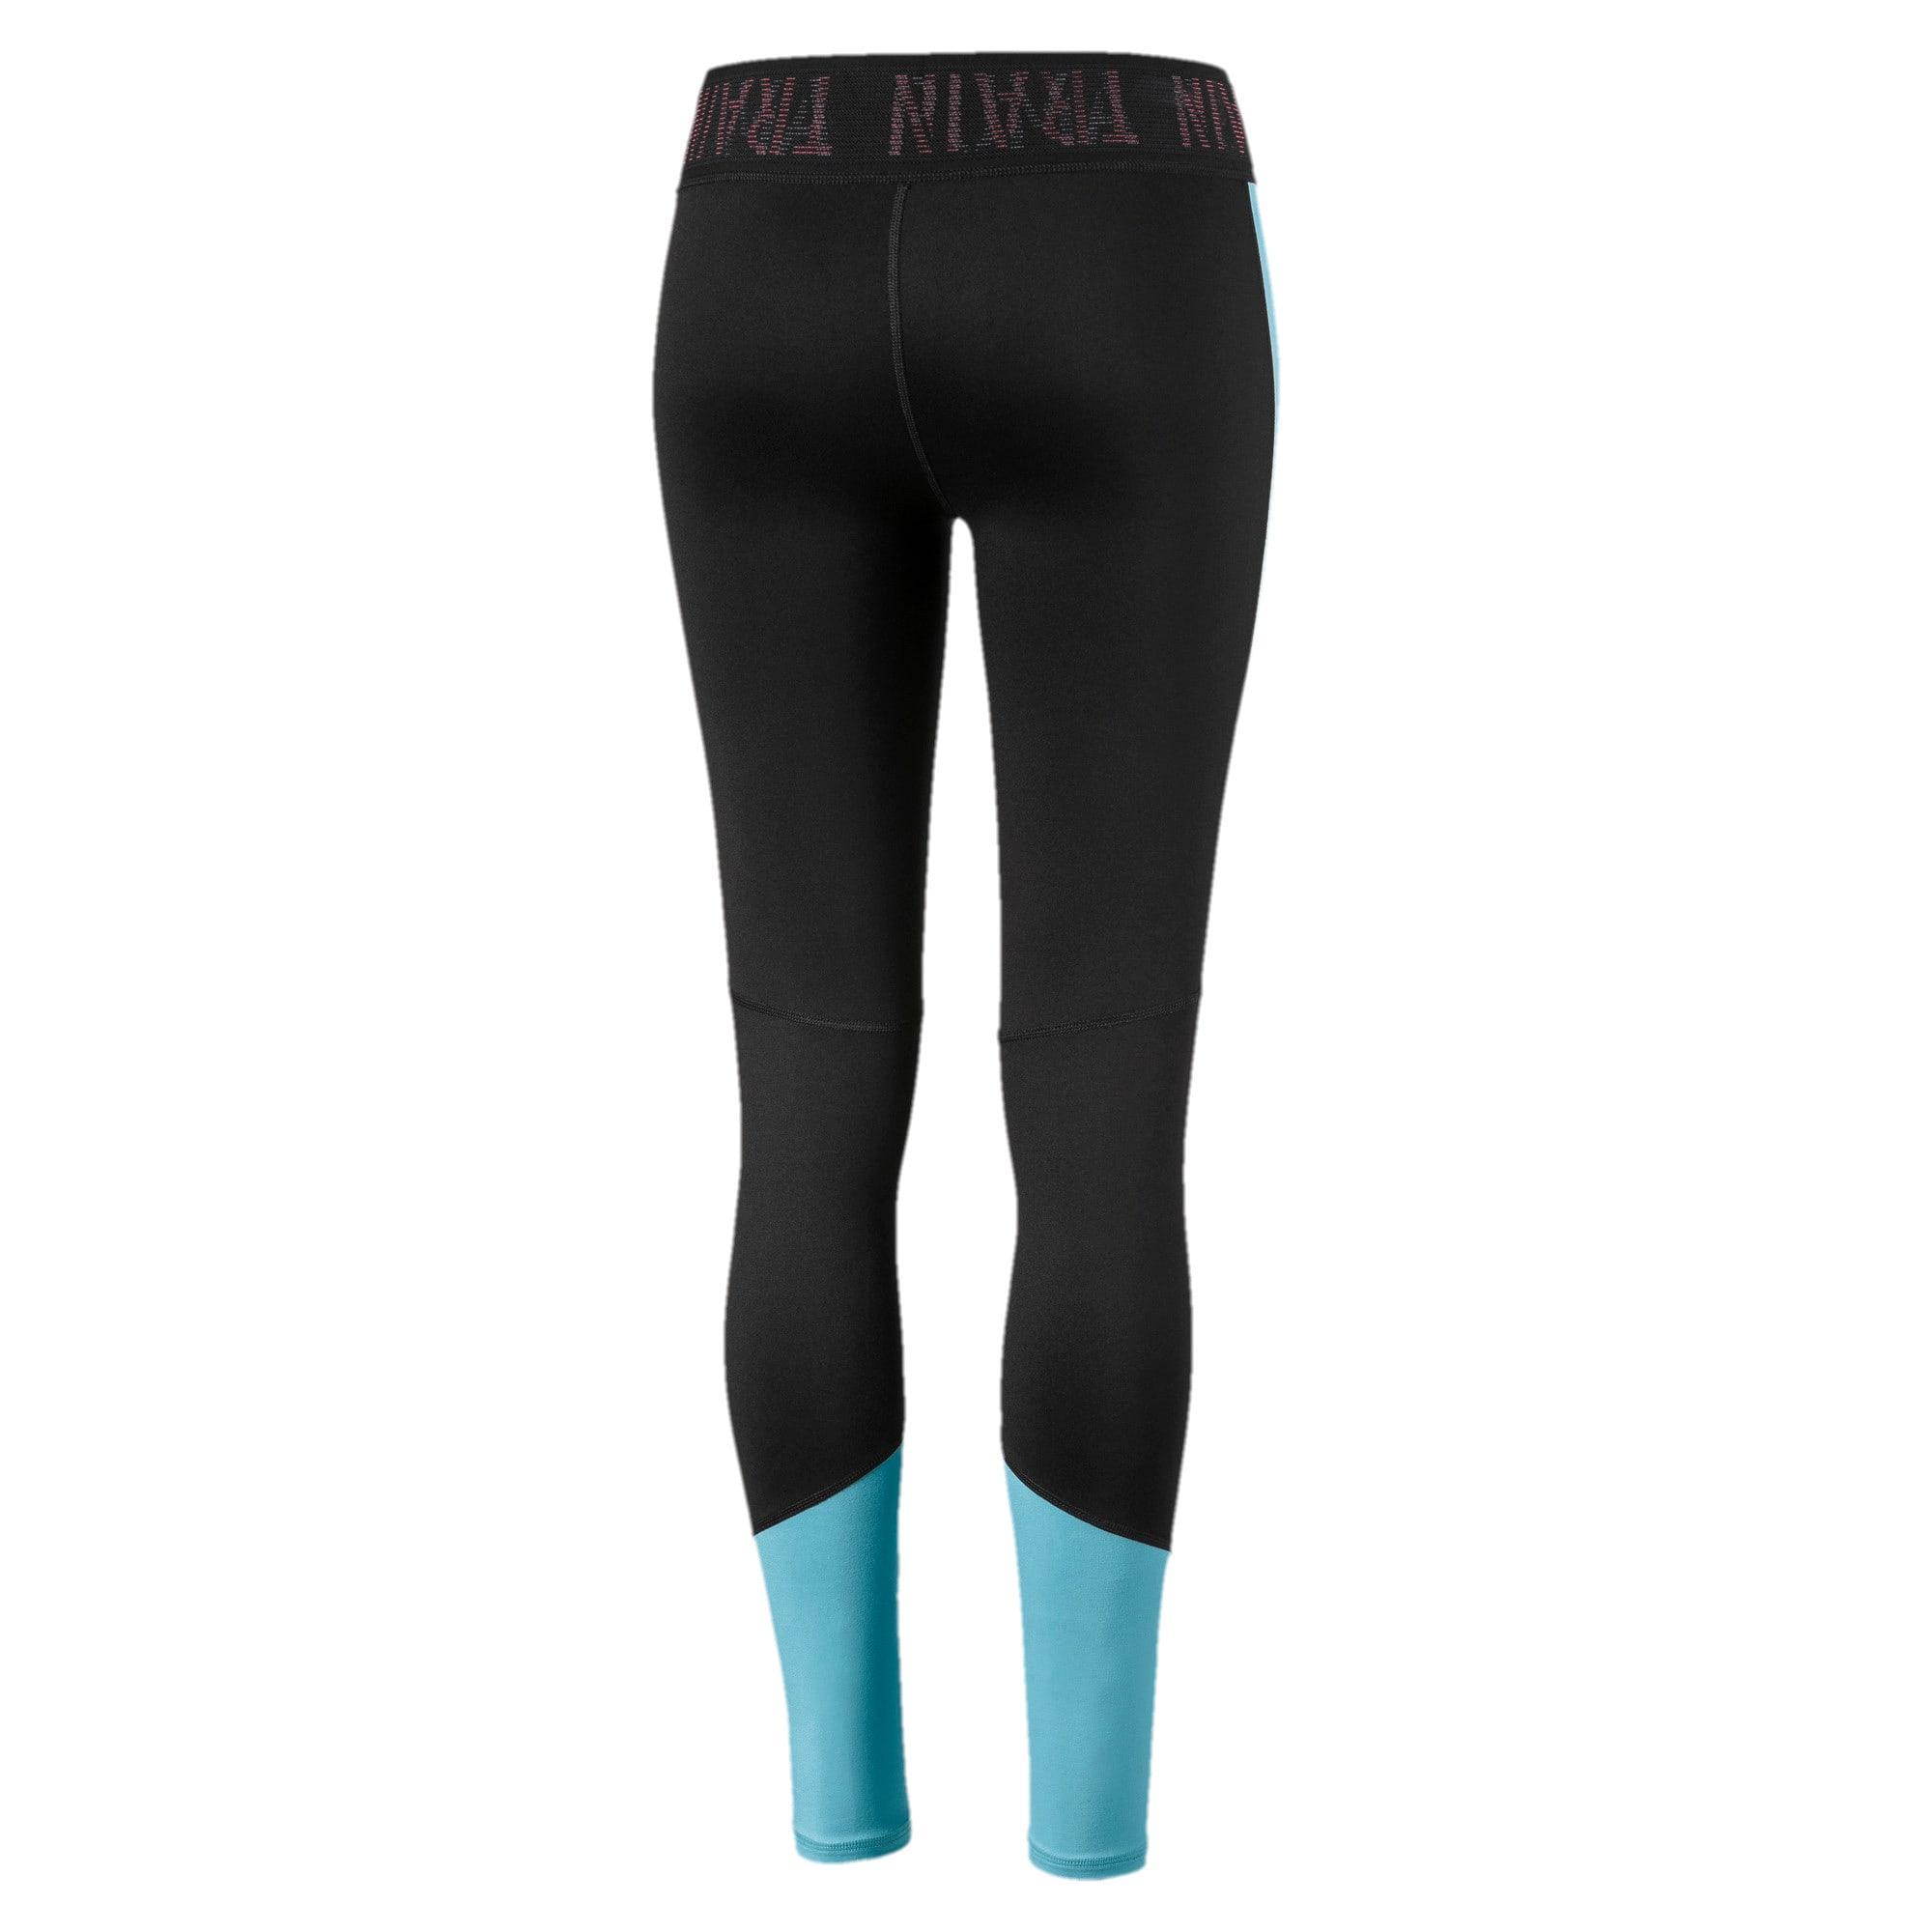 Thumbnail 5 of Logo Women's 7/8 Leggings, Puma Black-Milky Blue, medium